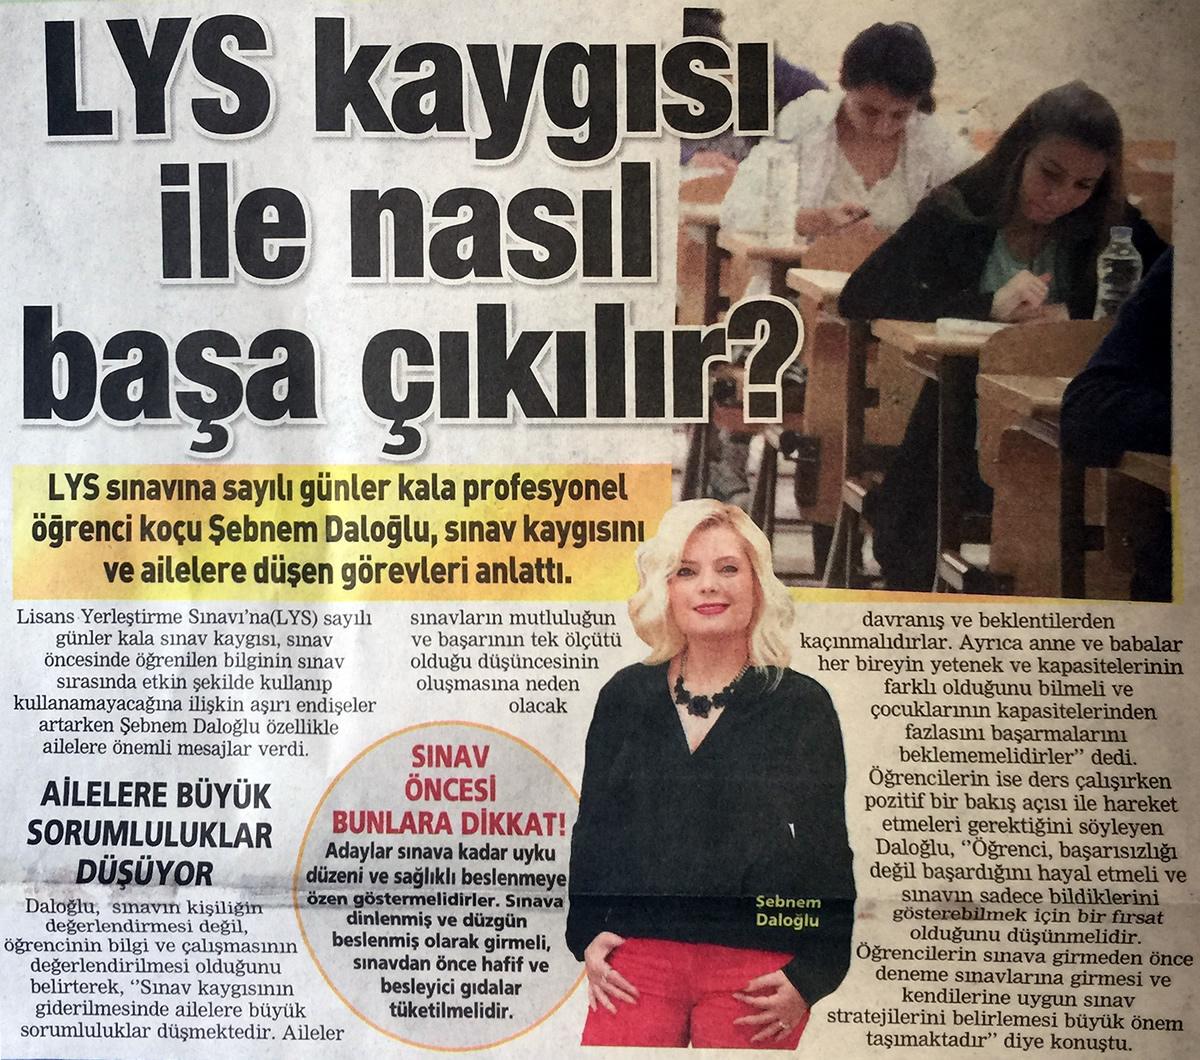 Posta Ankara Eki - 23 Mayıs 2015